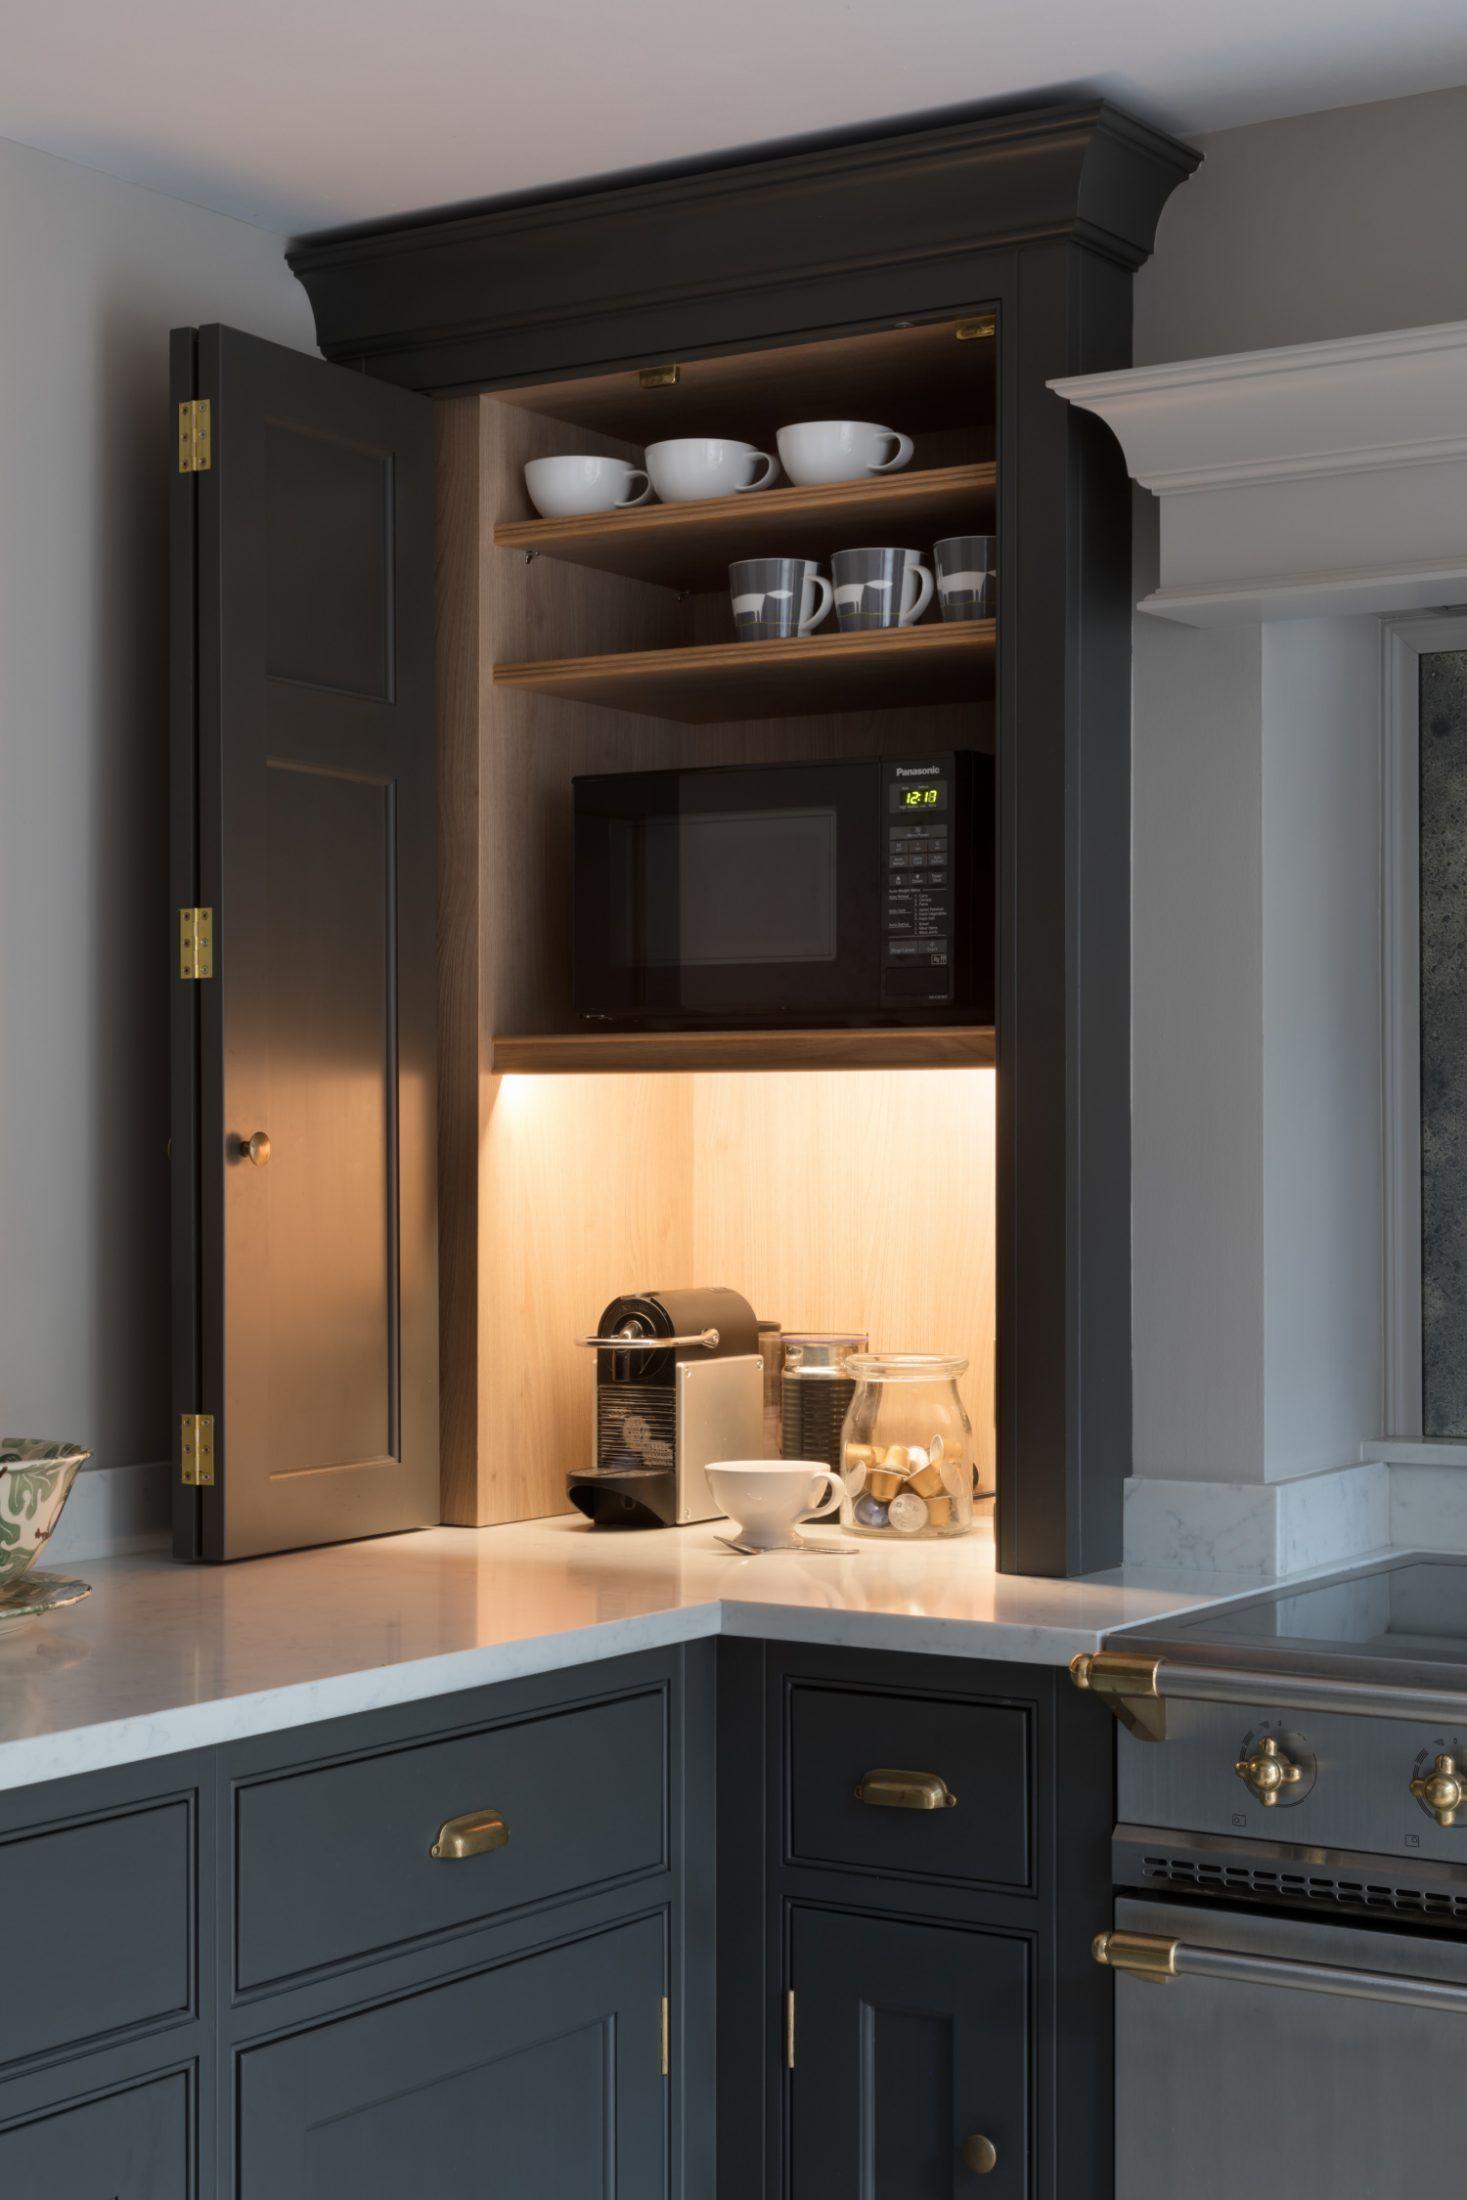 Country Corner Arredamento.Cambridge Country Kitchen Project Luxury Dark Painted